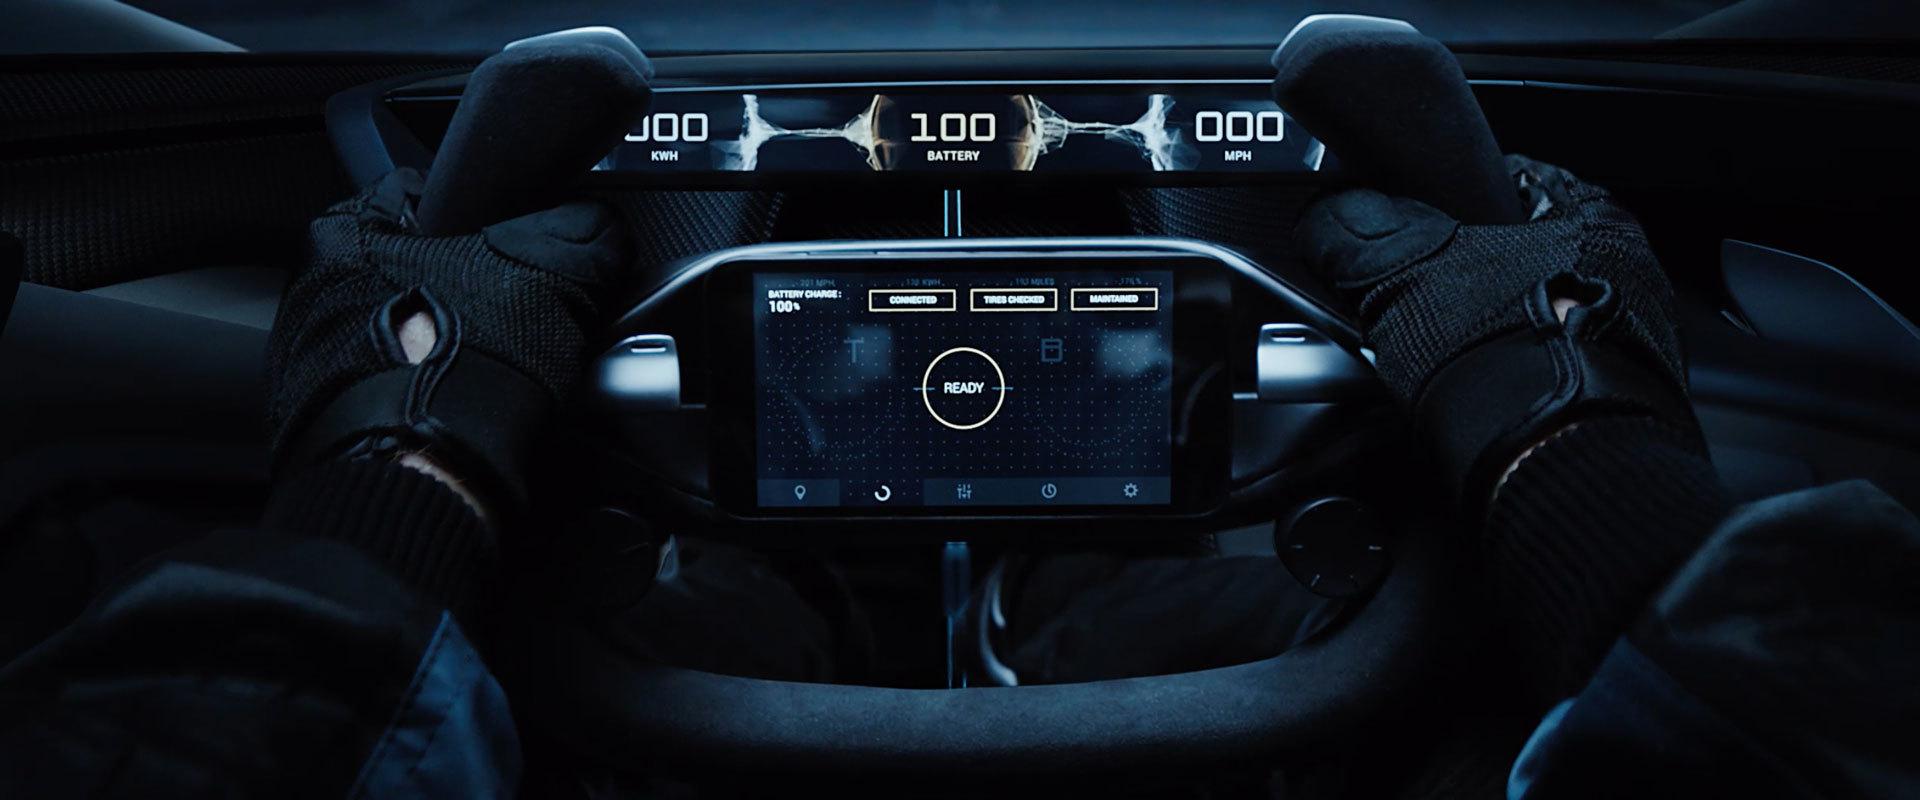 Faraday Future представила концепт модульной платформы электромобилей и суперкар FFZERO1 - 3